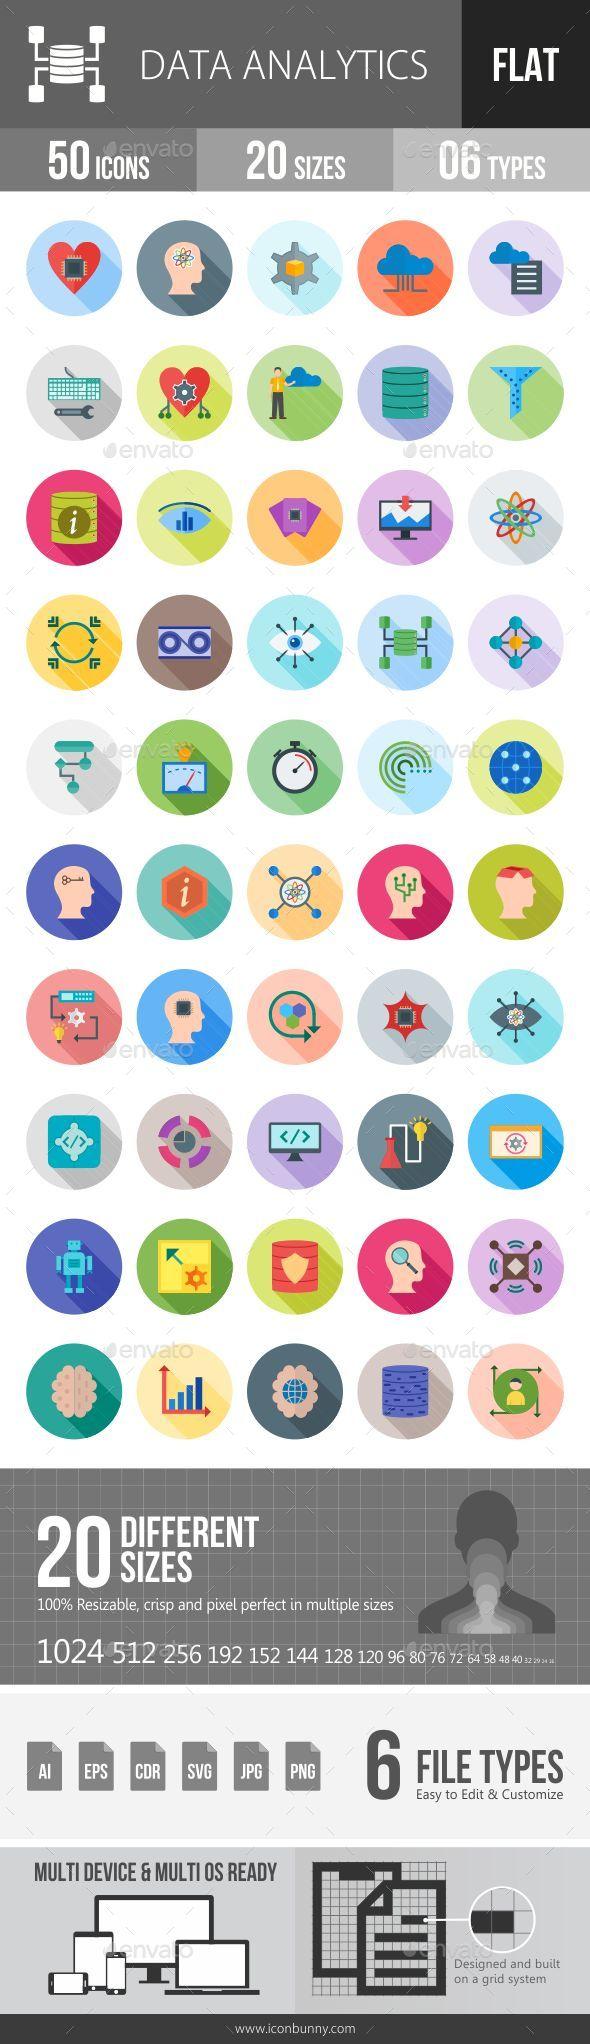 Data Analytics Flat Shadowed Icons - Icons